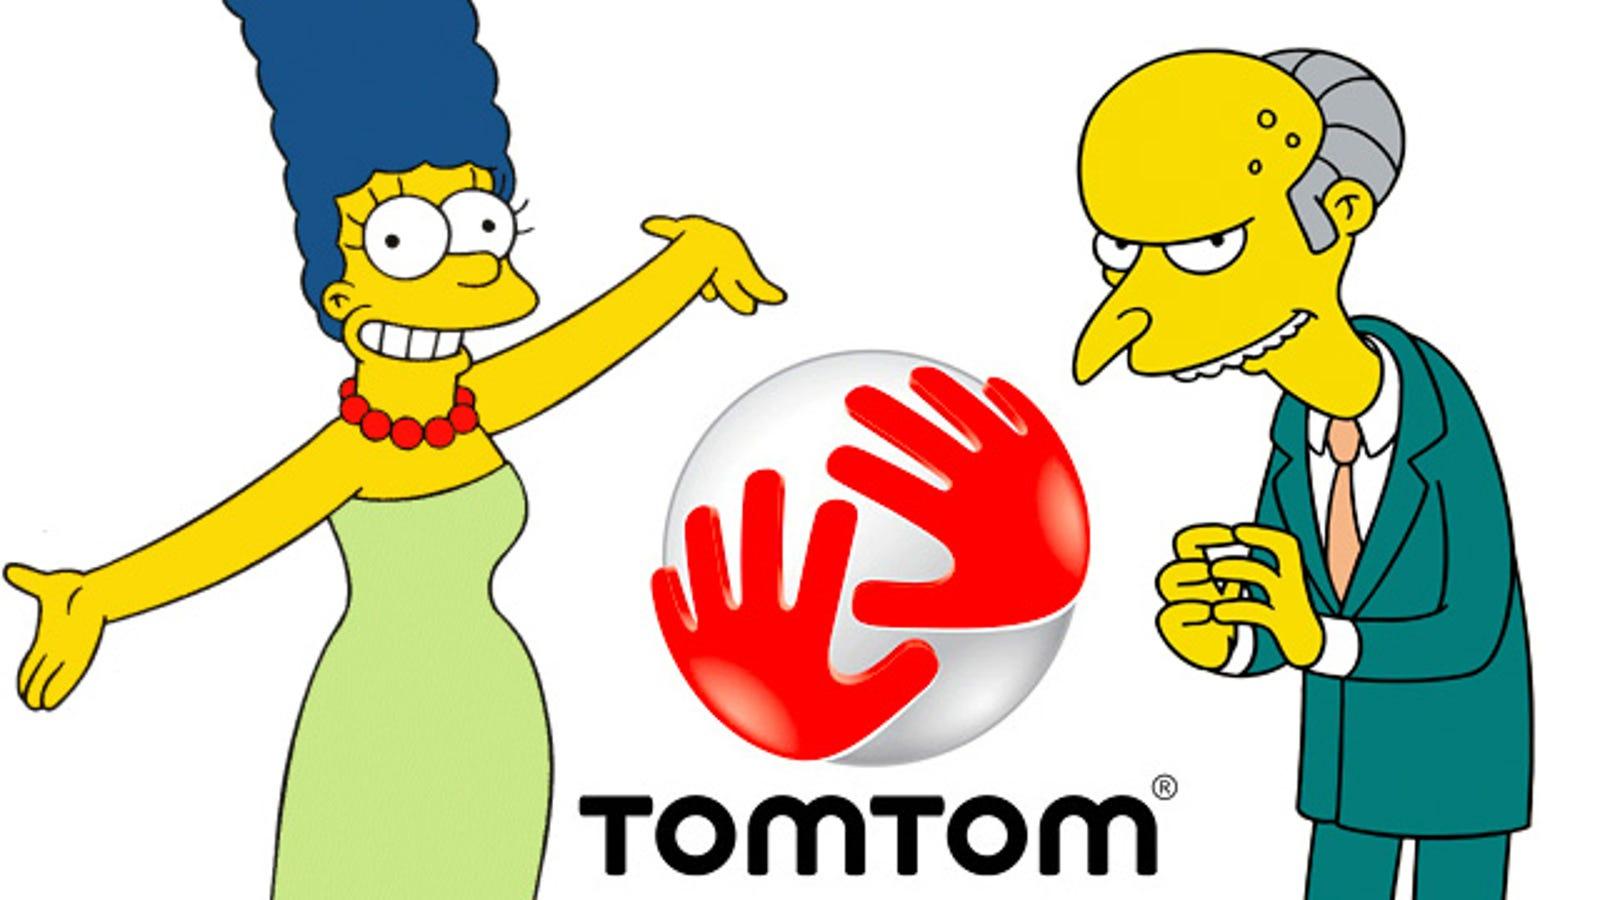 Tomtom celebrity voice